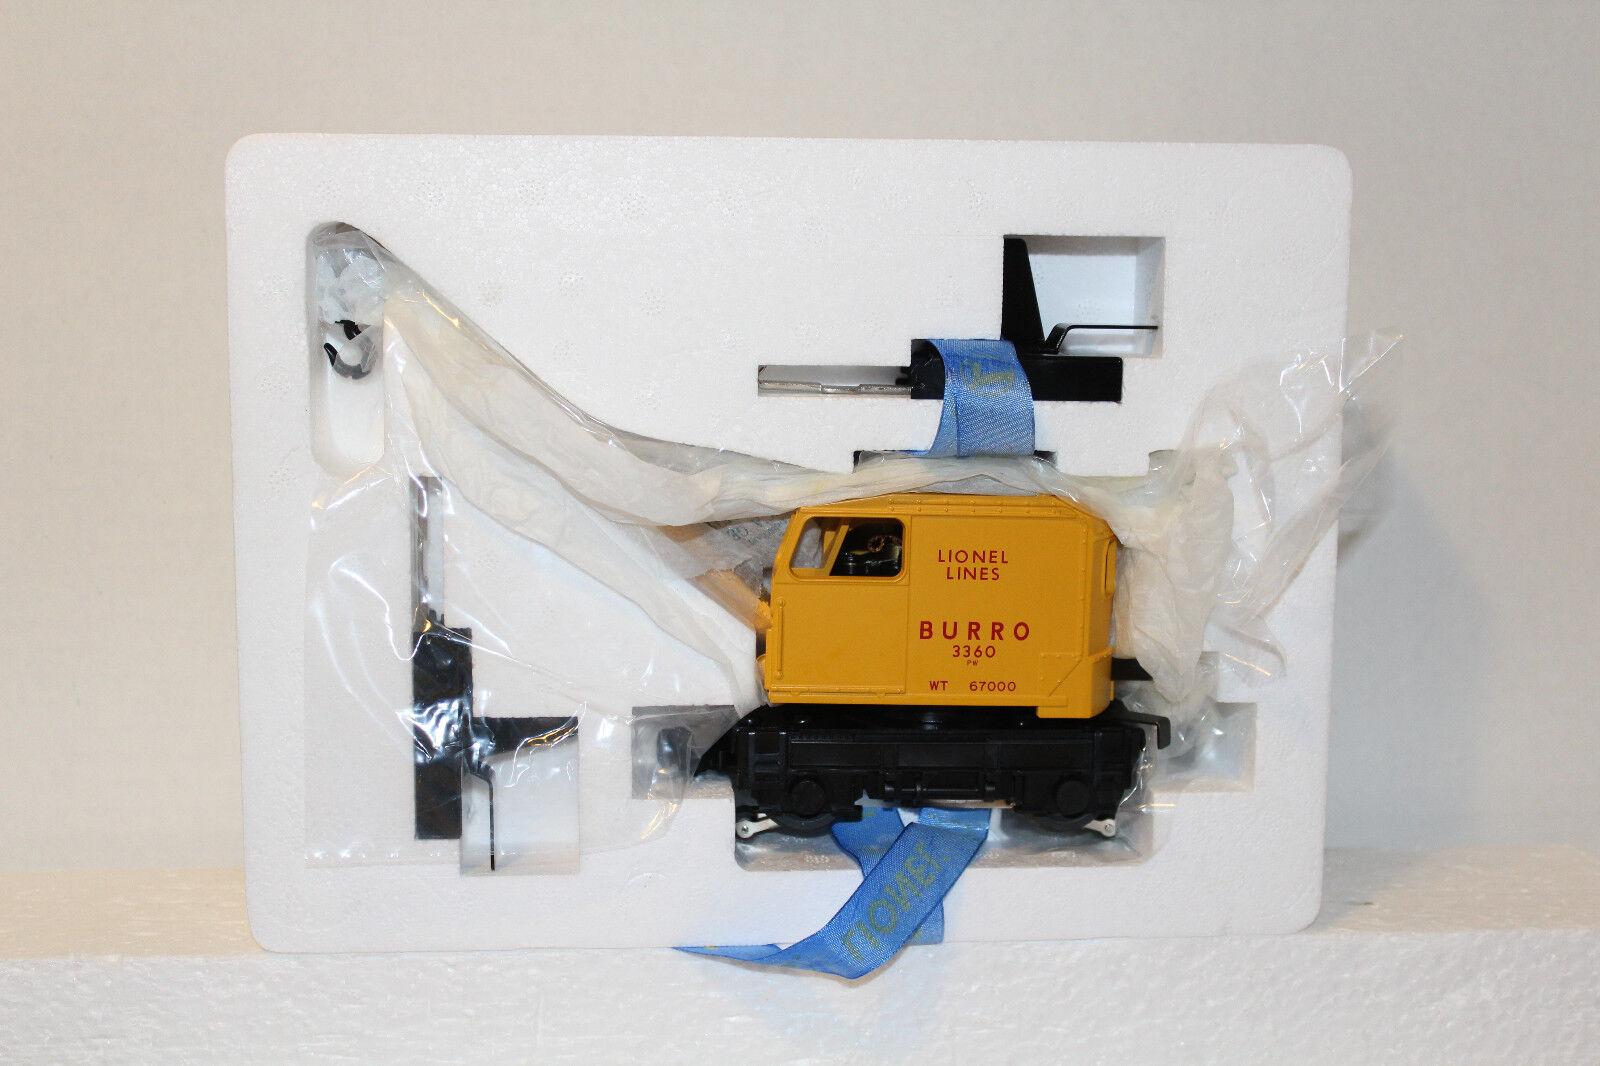 Lionel  28414 PwC  3360 Lionel líneas Burro Crane (remake)